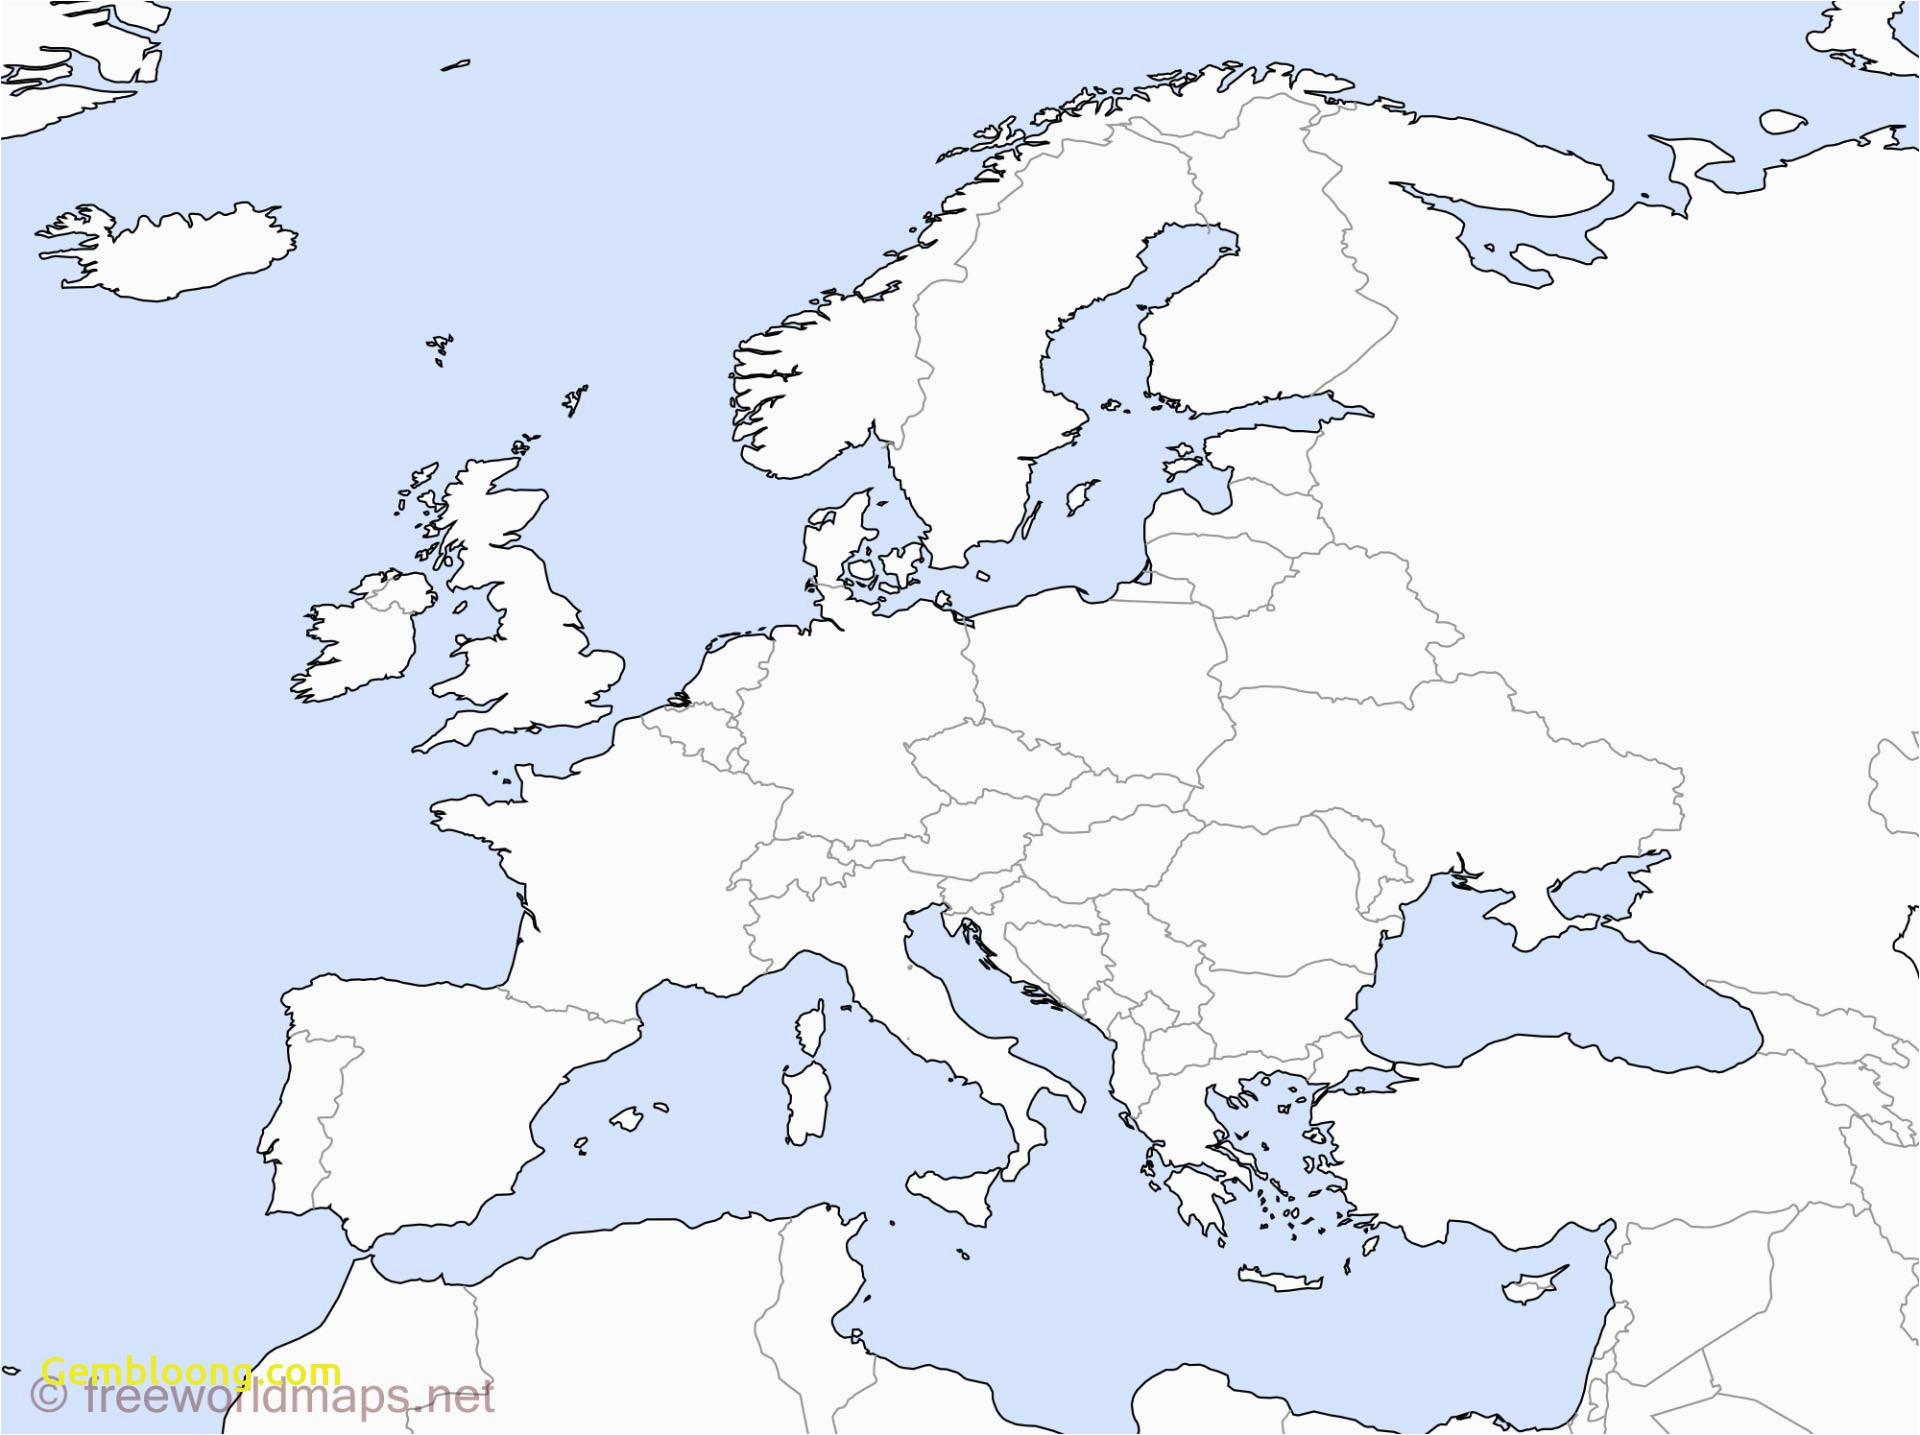 53 categorical world map outline europe